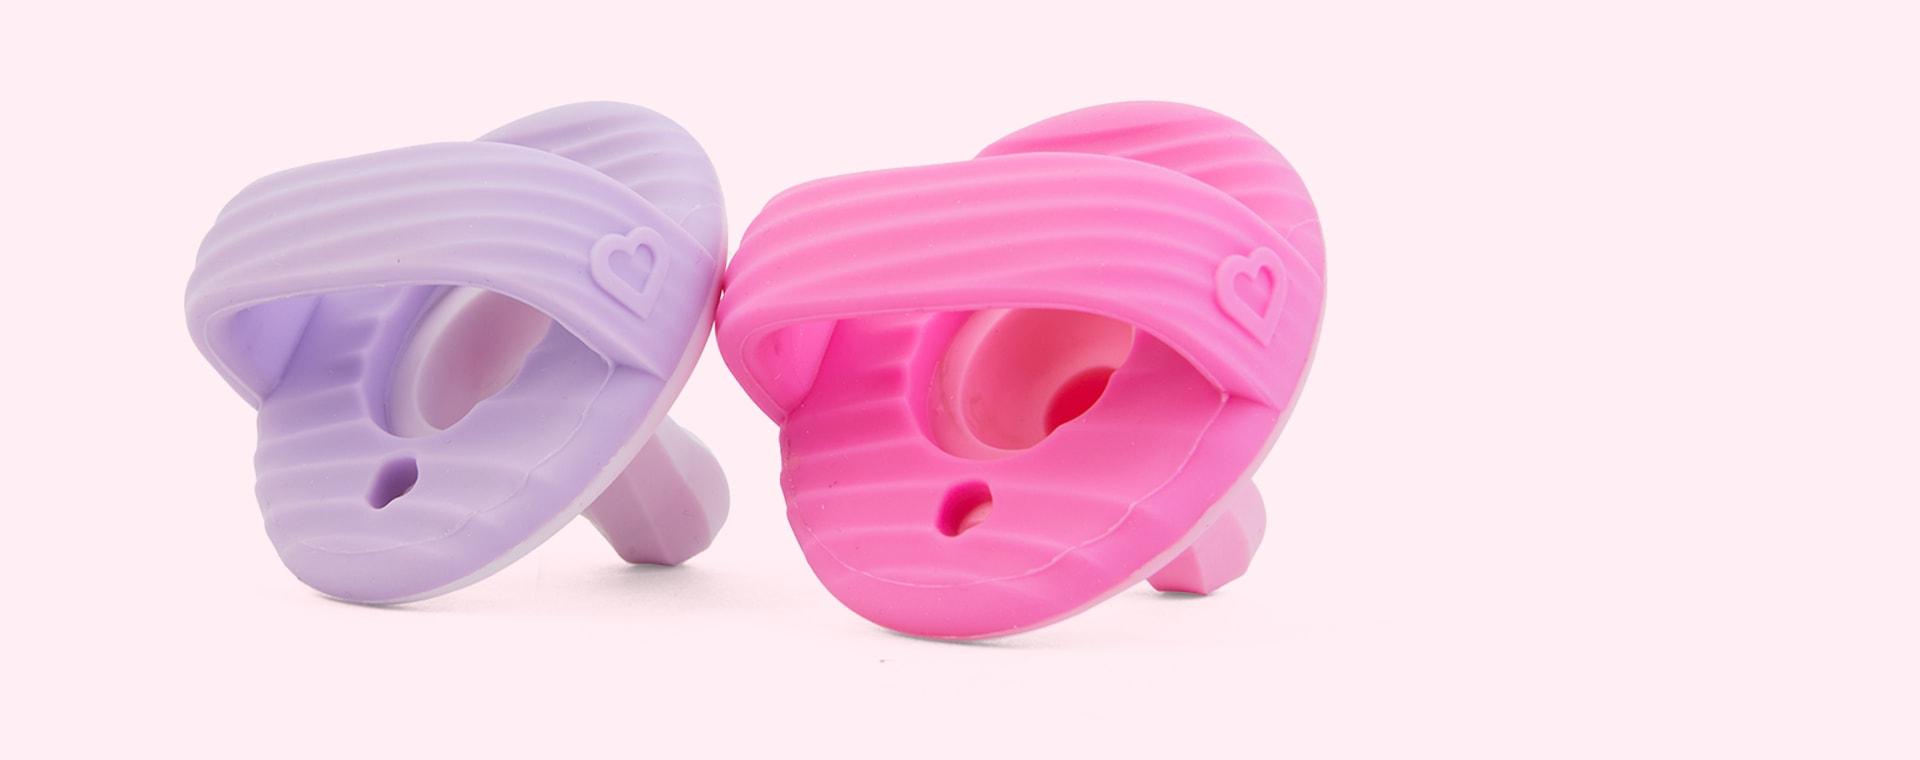 Pink/Purple Munchkin 2-Pack Sili-Soothe & Teethe Pacifiers & Teethers